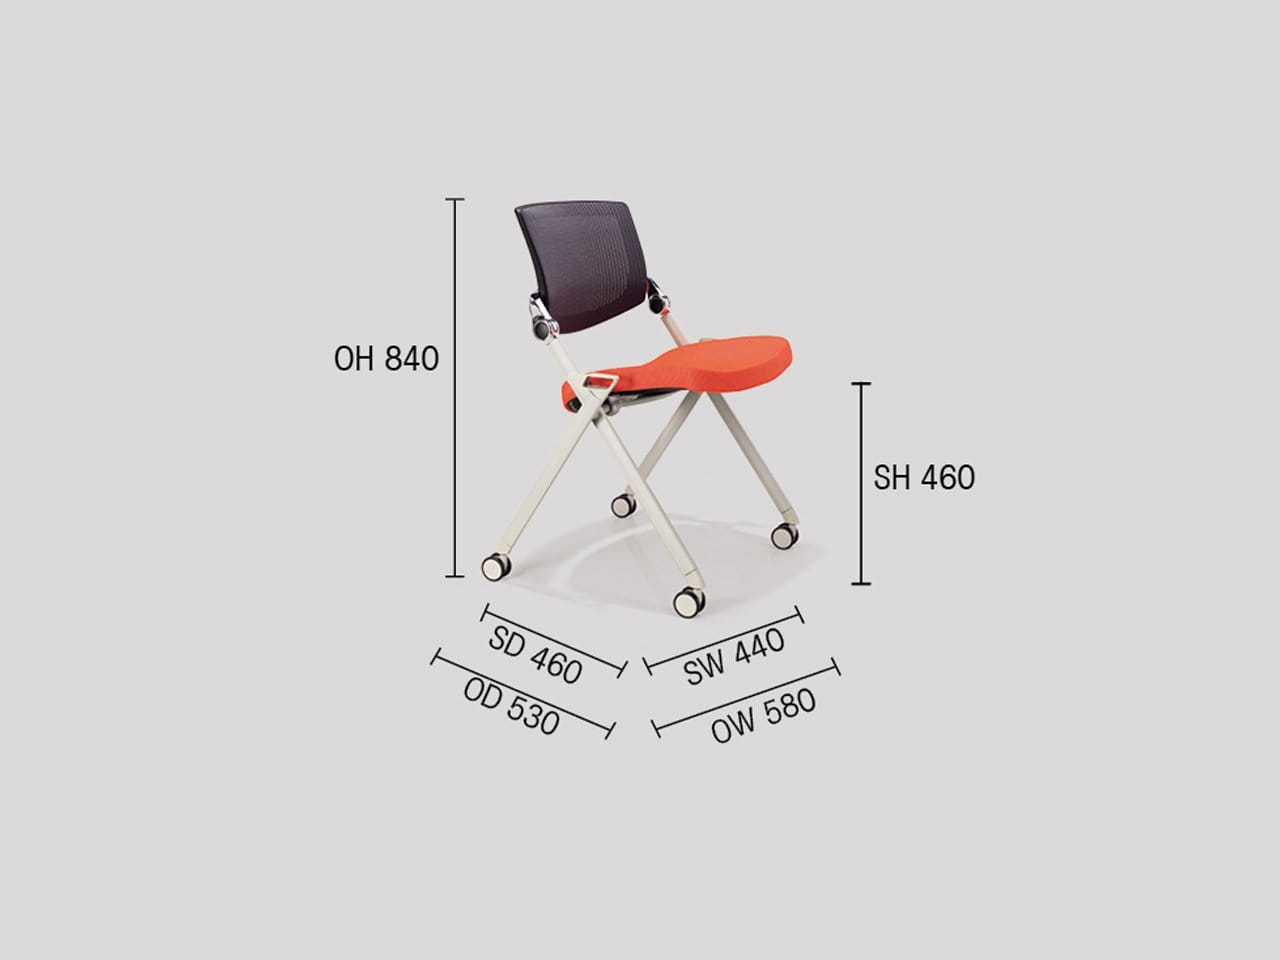 putra side tablet with castors comfort design the chair table people. Black Bedroom Furniture Sets. Home Design Ideas